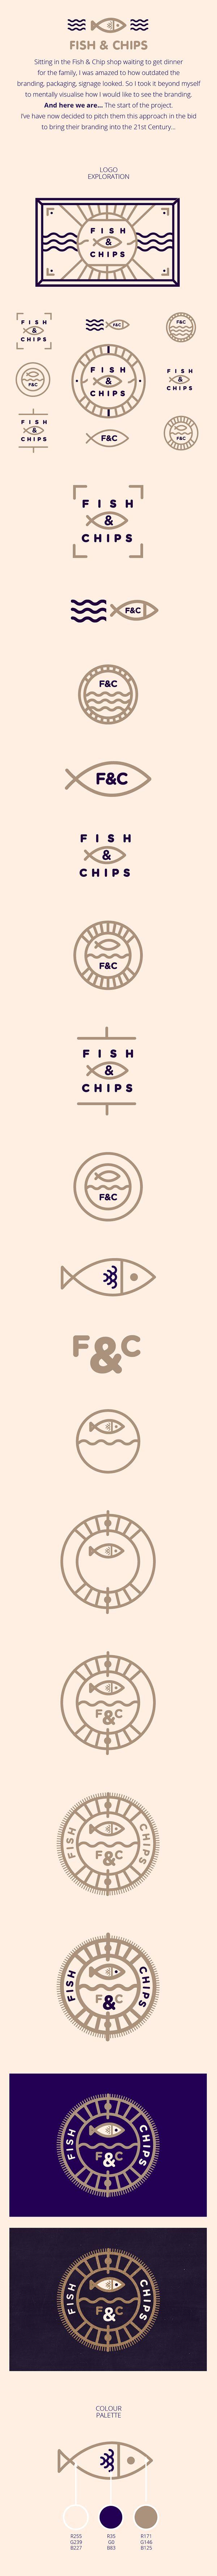 https://www.behance.net/gallery/23979655/Fish-Chips-Branding